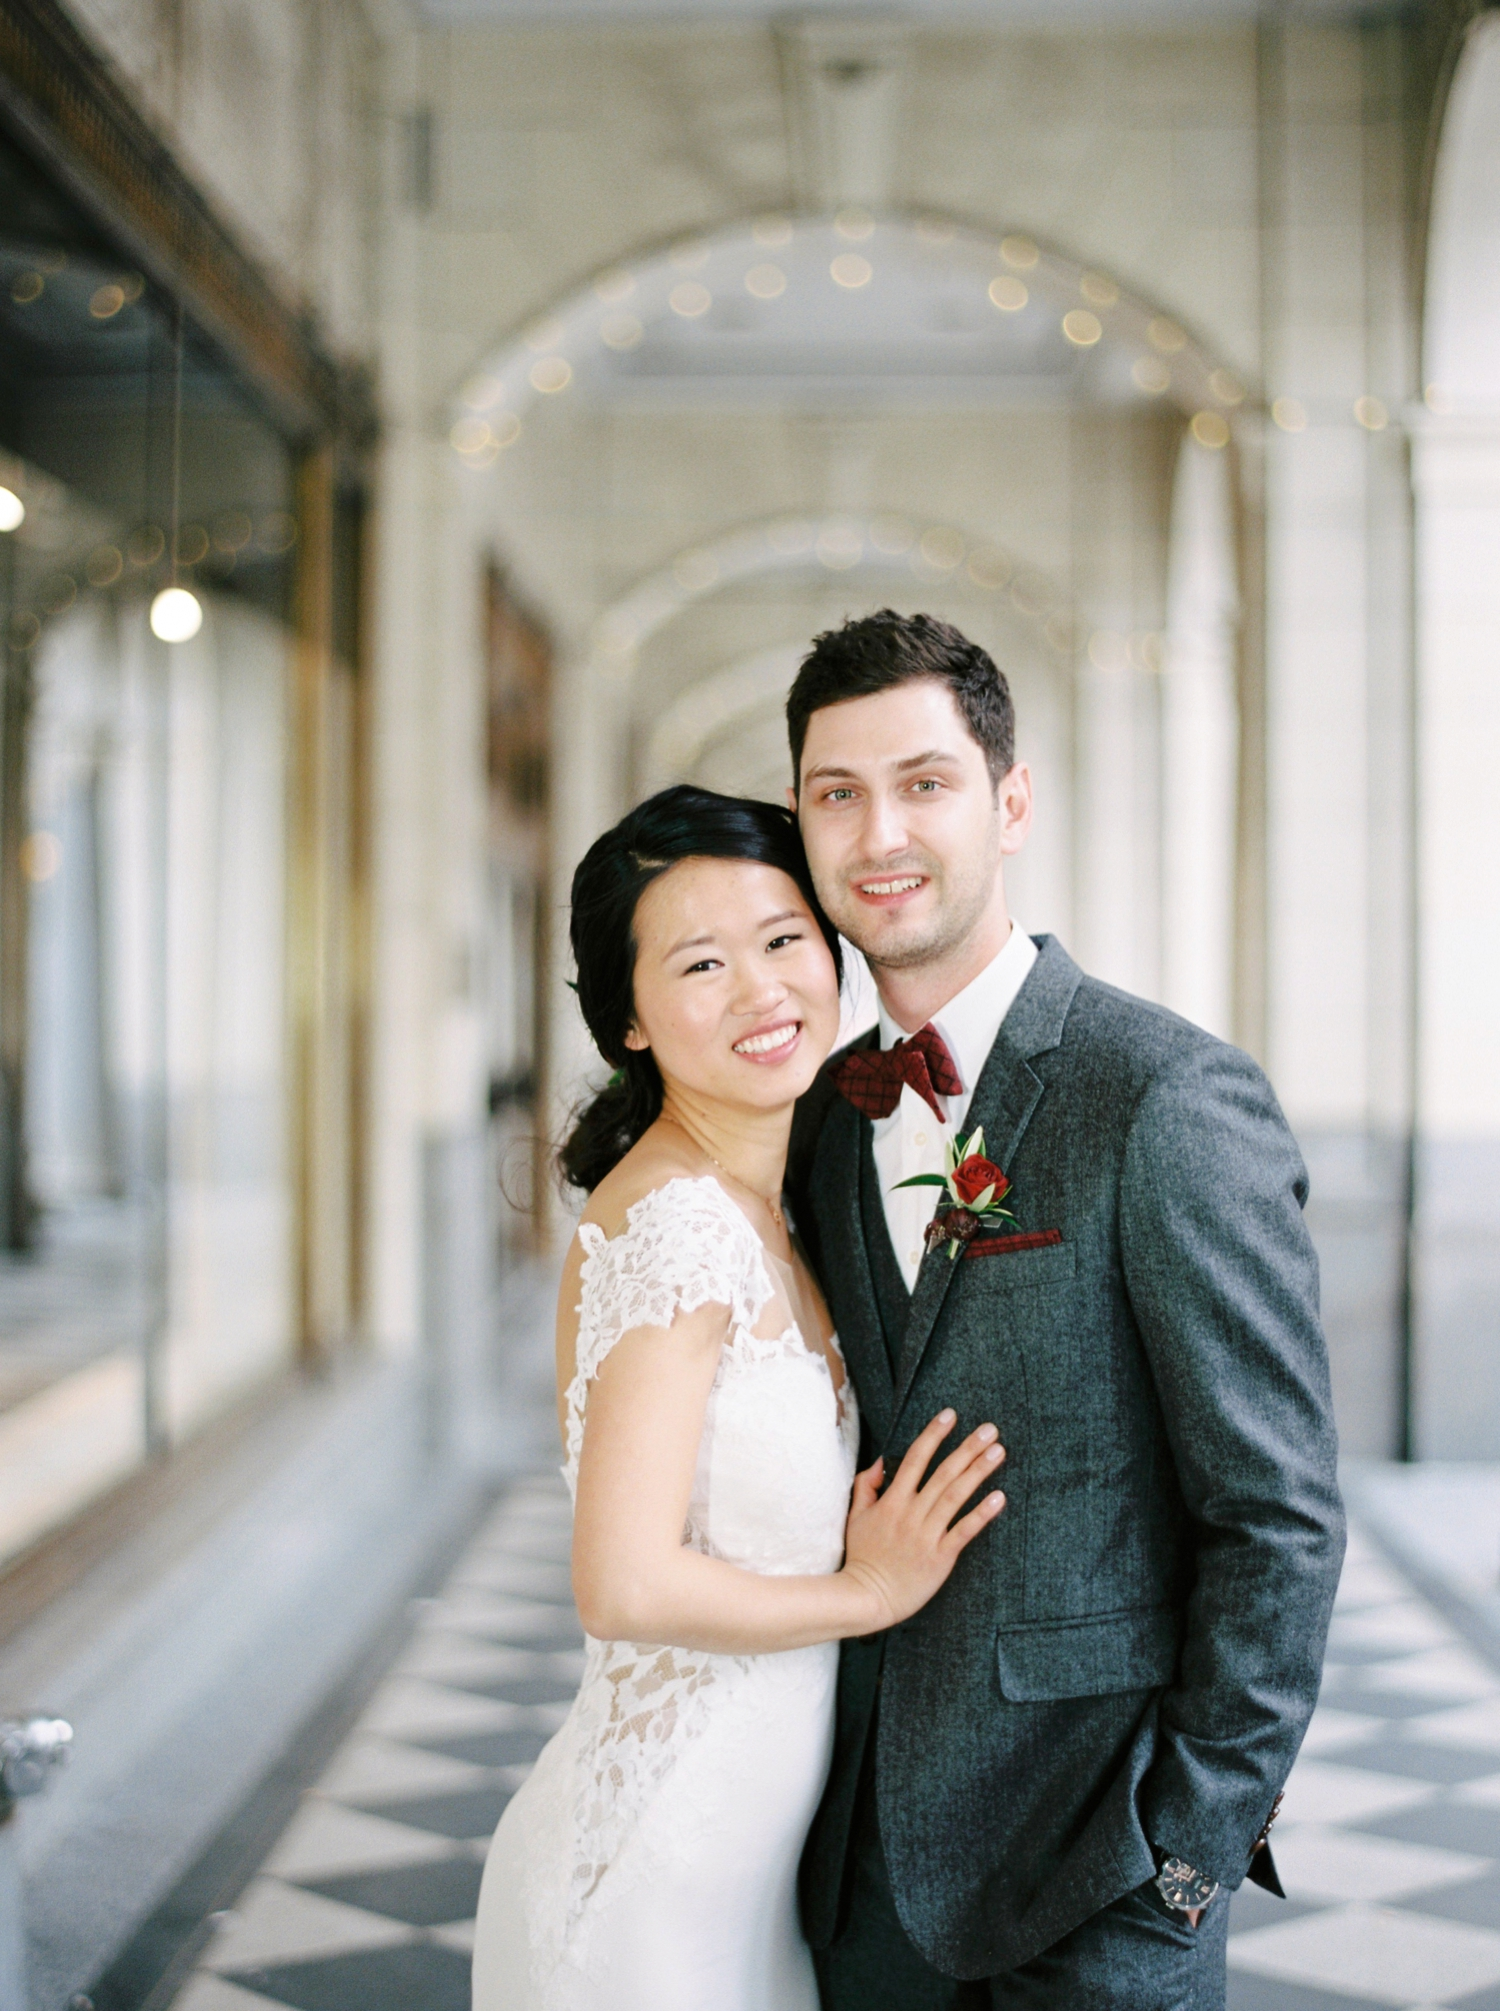 Calgary wedding photographer | fine art film photography | Calgary Wedding Photographers | Calgary couples photographer | Justine Milton Photography | workshop wedding | couples portrait